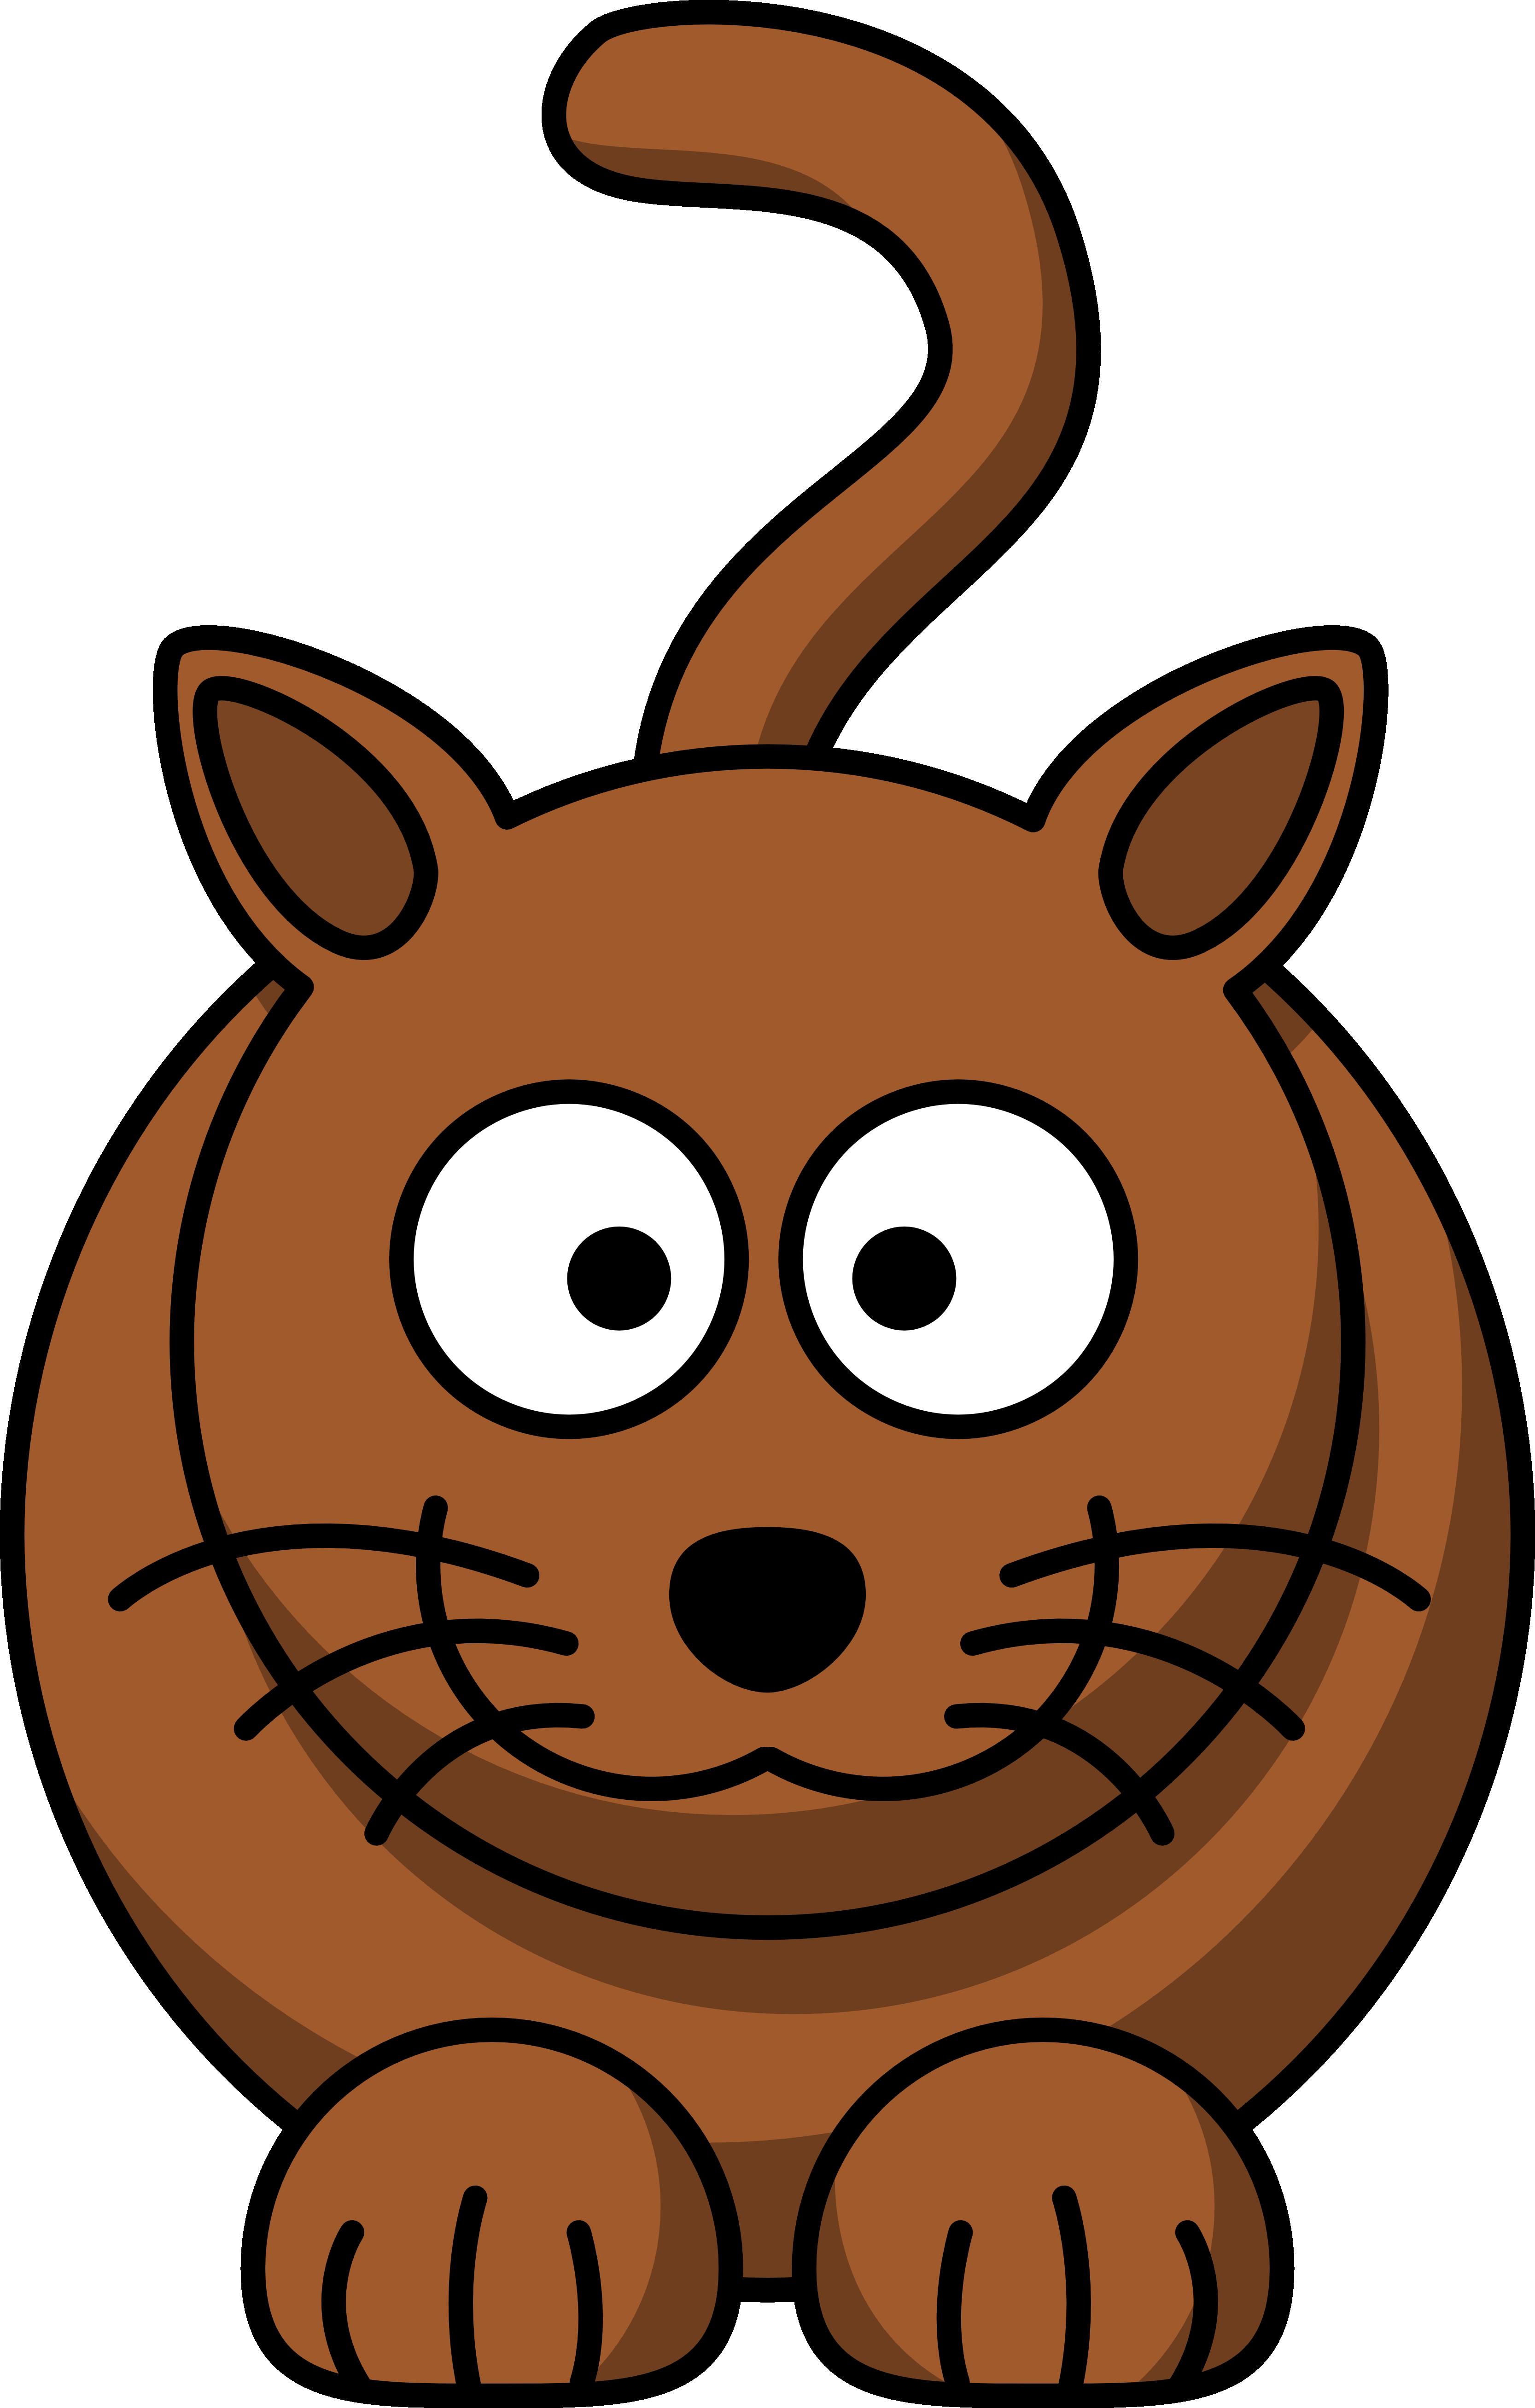 Clipart cat illustration. Cartoon brown free image